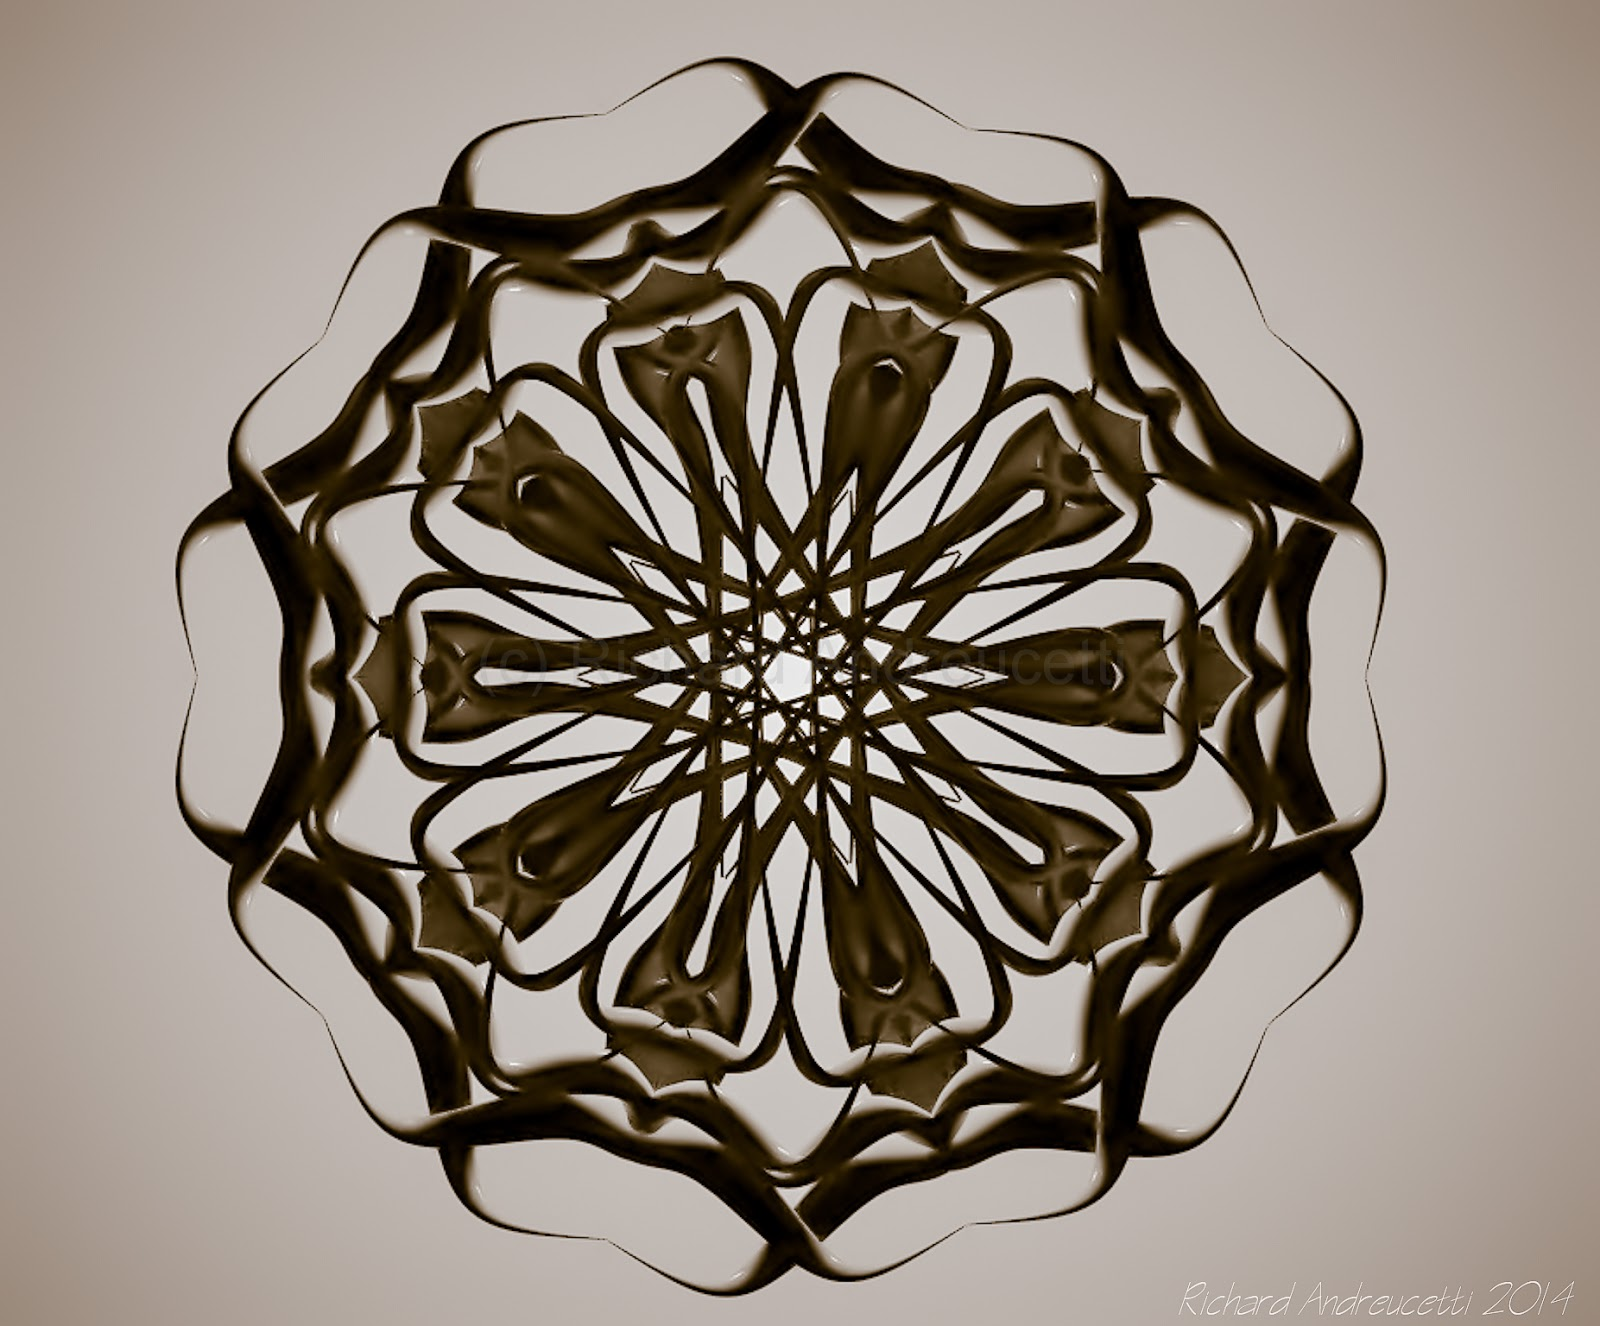 irish abstract artist, album cover artist